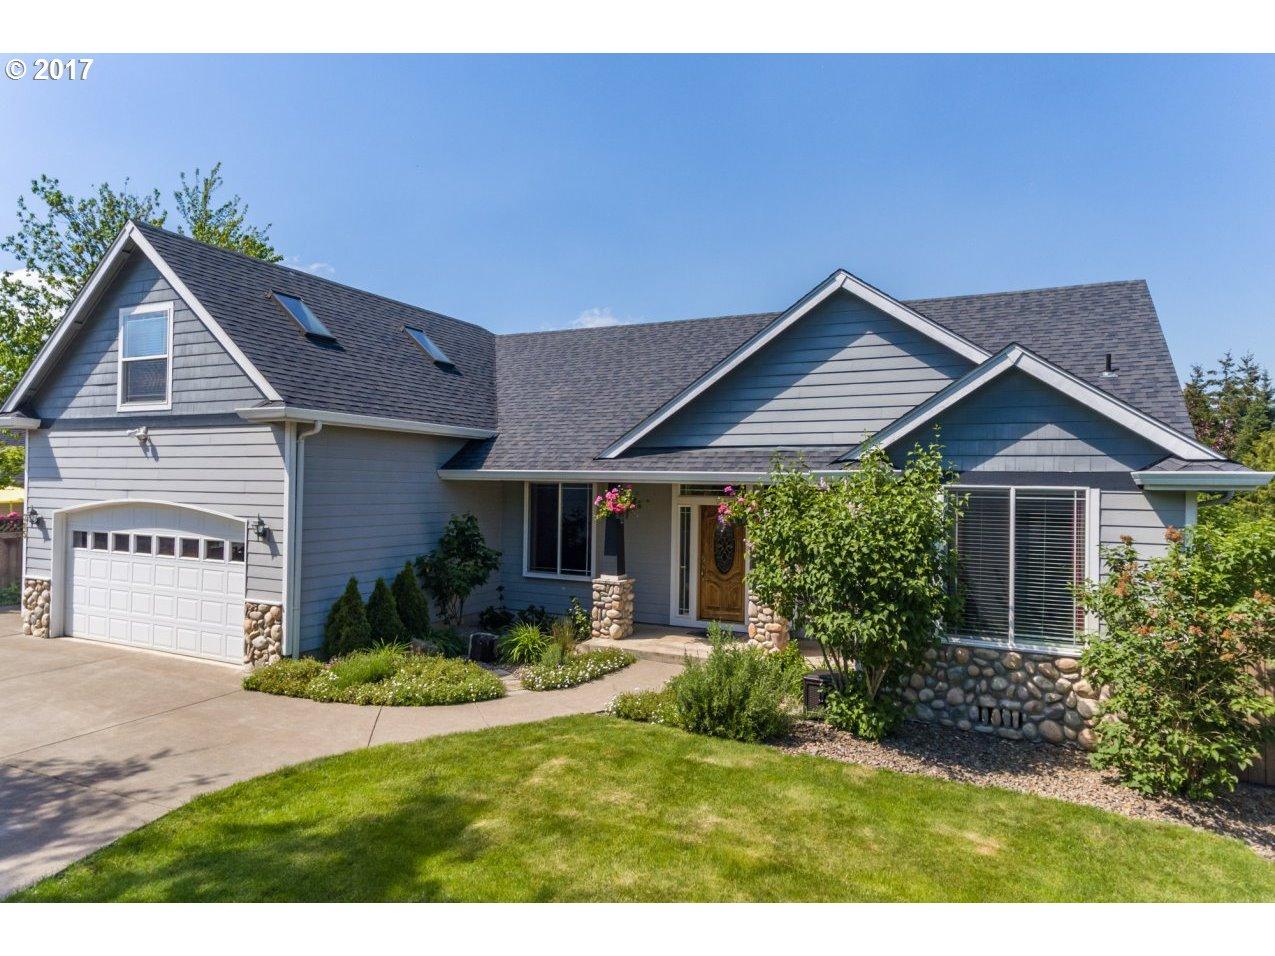 285 MACKIN AVE, Eugene, OR 97404